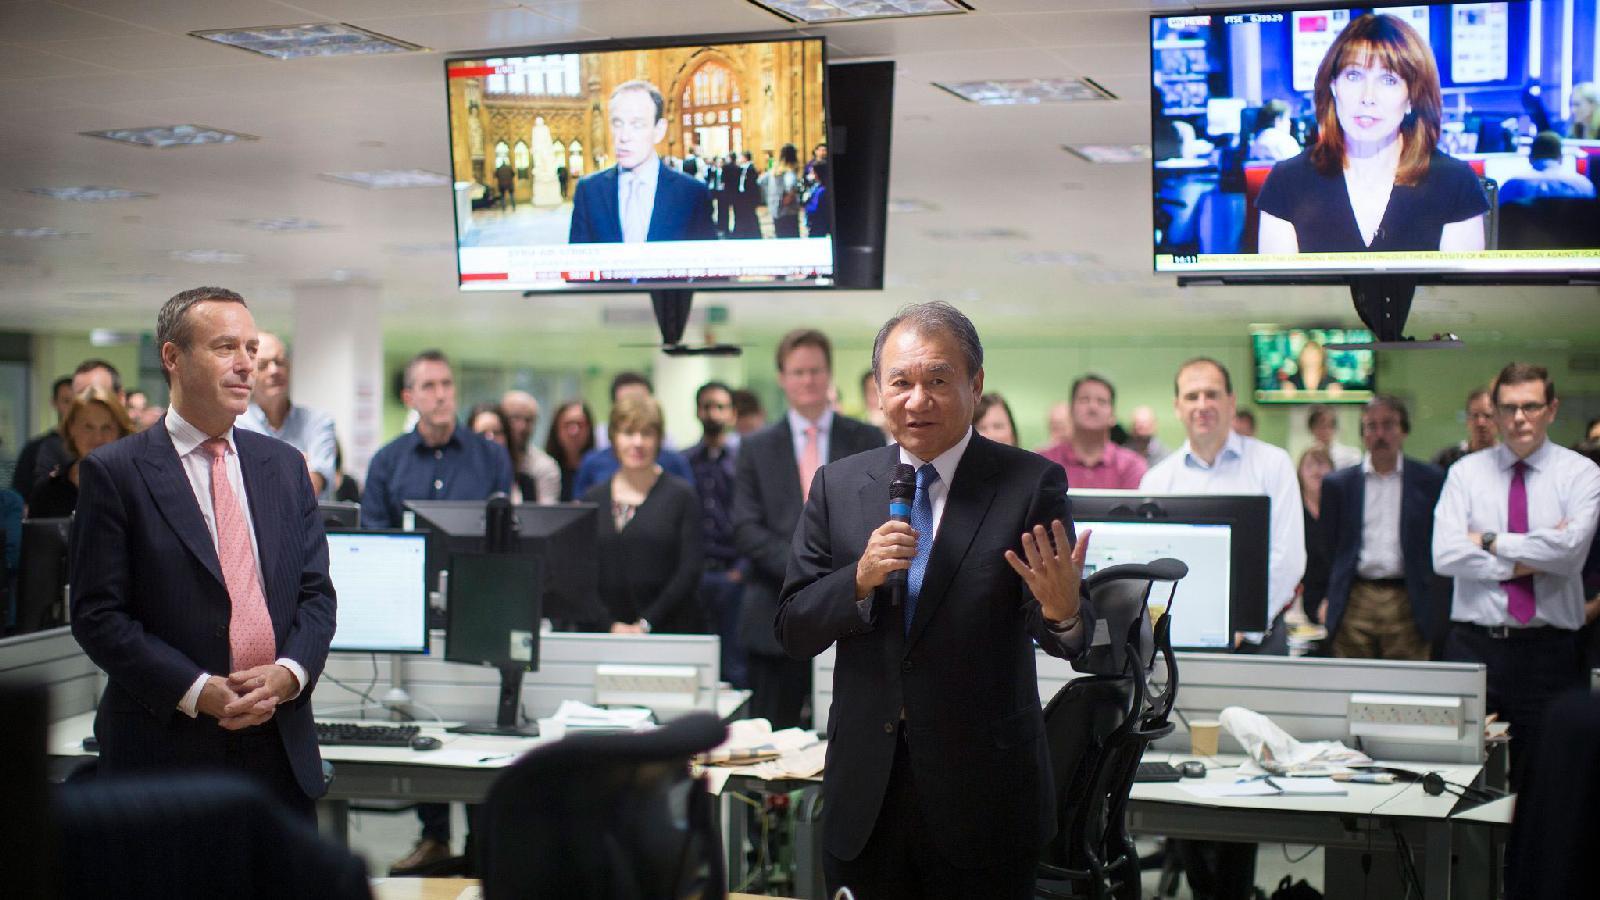 Президент Nikkei Цунео Кита навстрече средакцией The Financial Times. Слева — главный редактор издания Лайонел Барбер